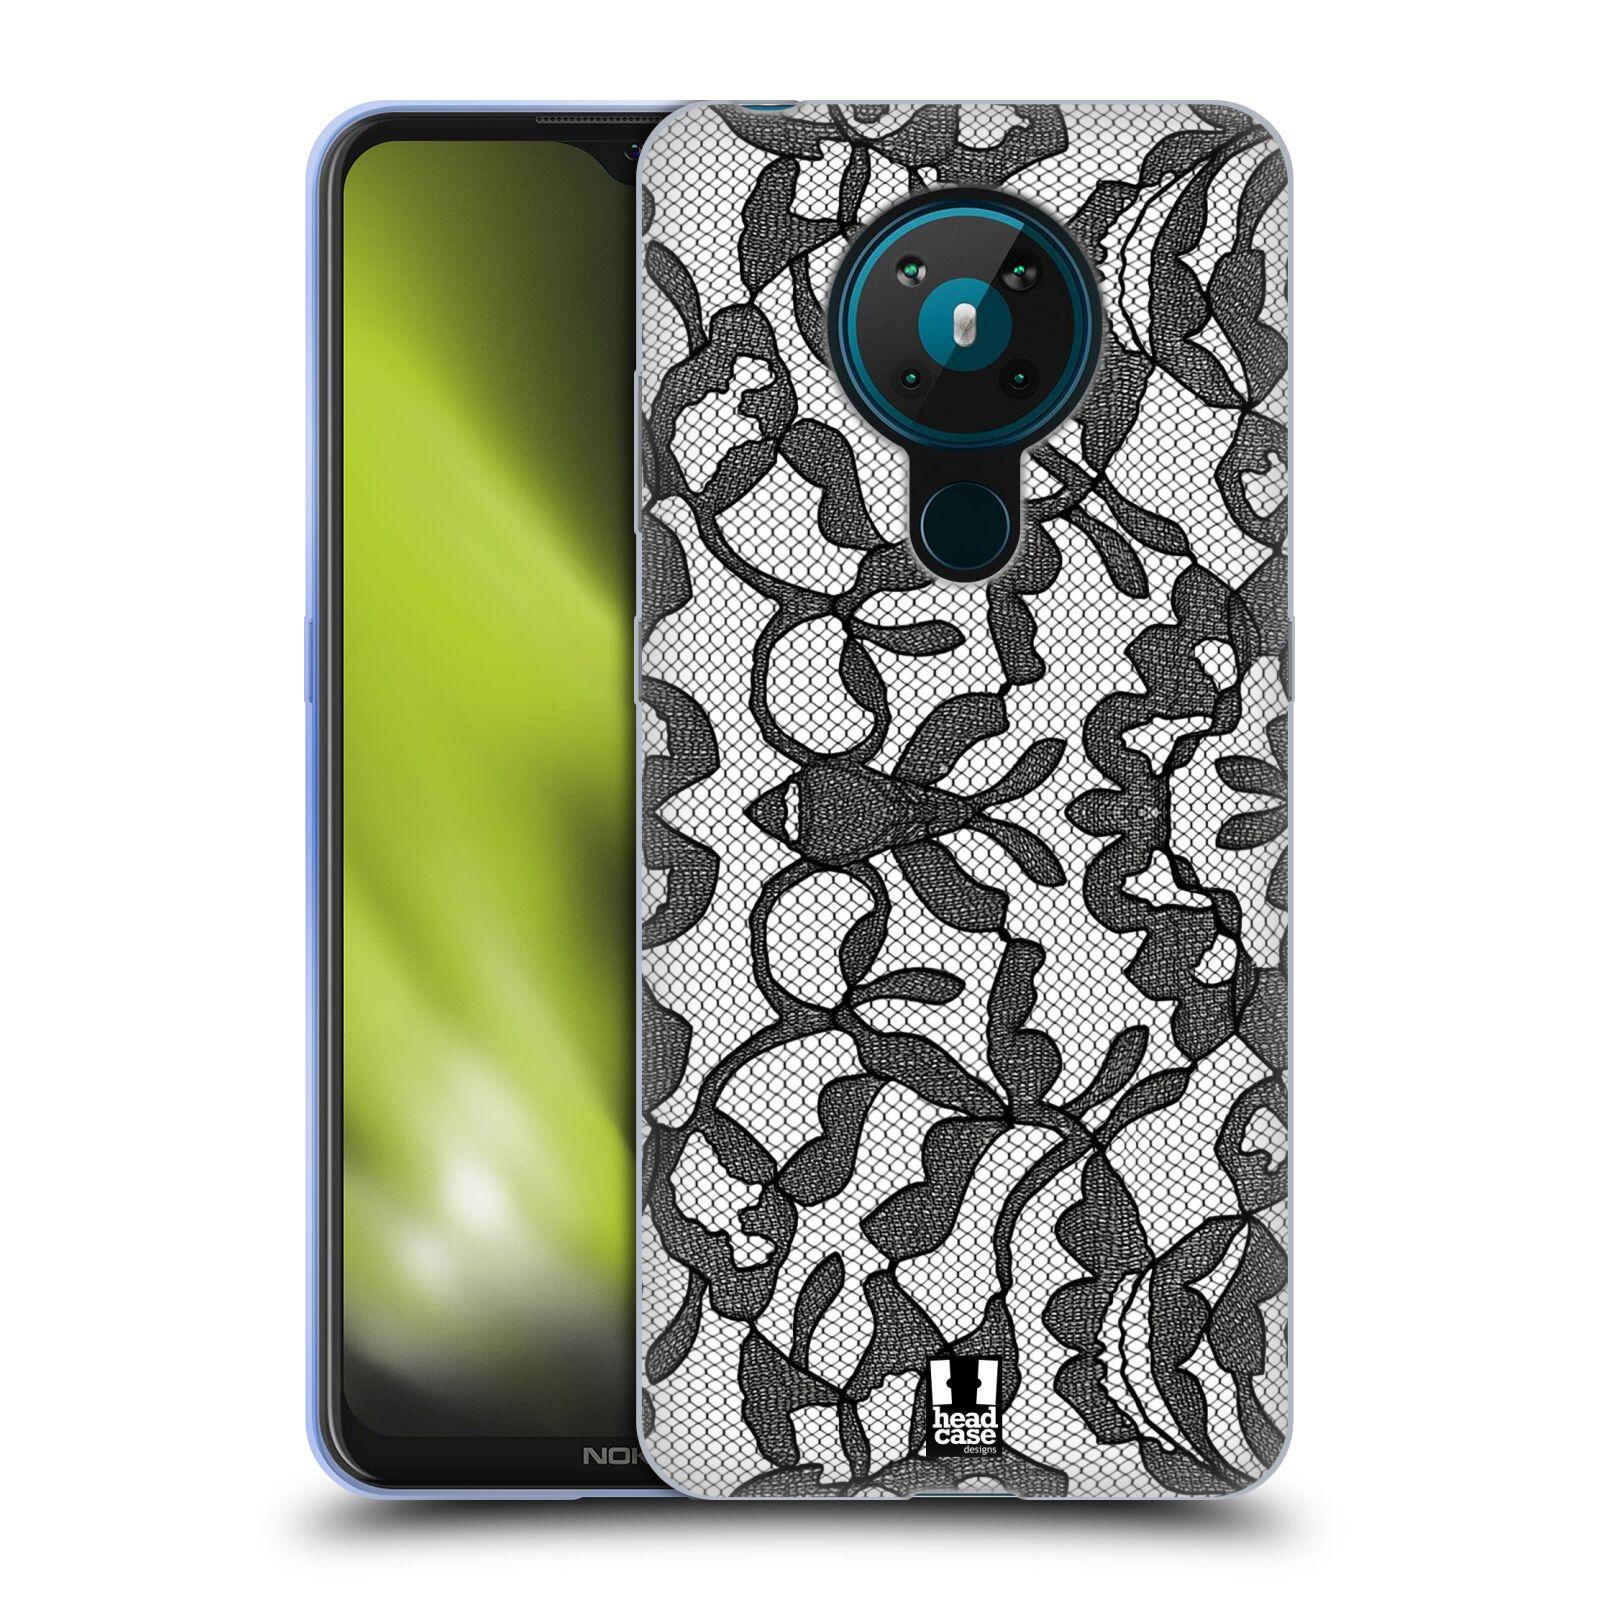 Silikonové pouzdro na mobil Nokia 5.3 - Head Case - LEAFY KRAJKA